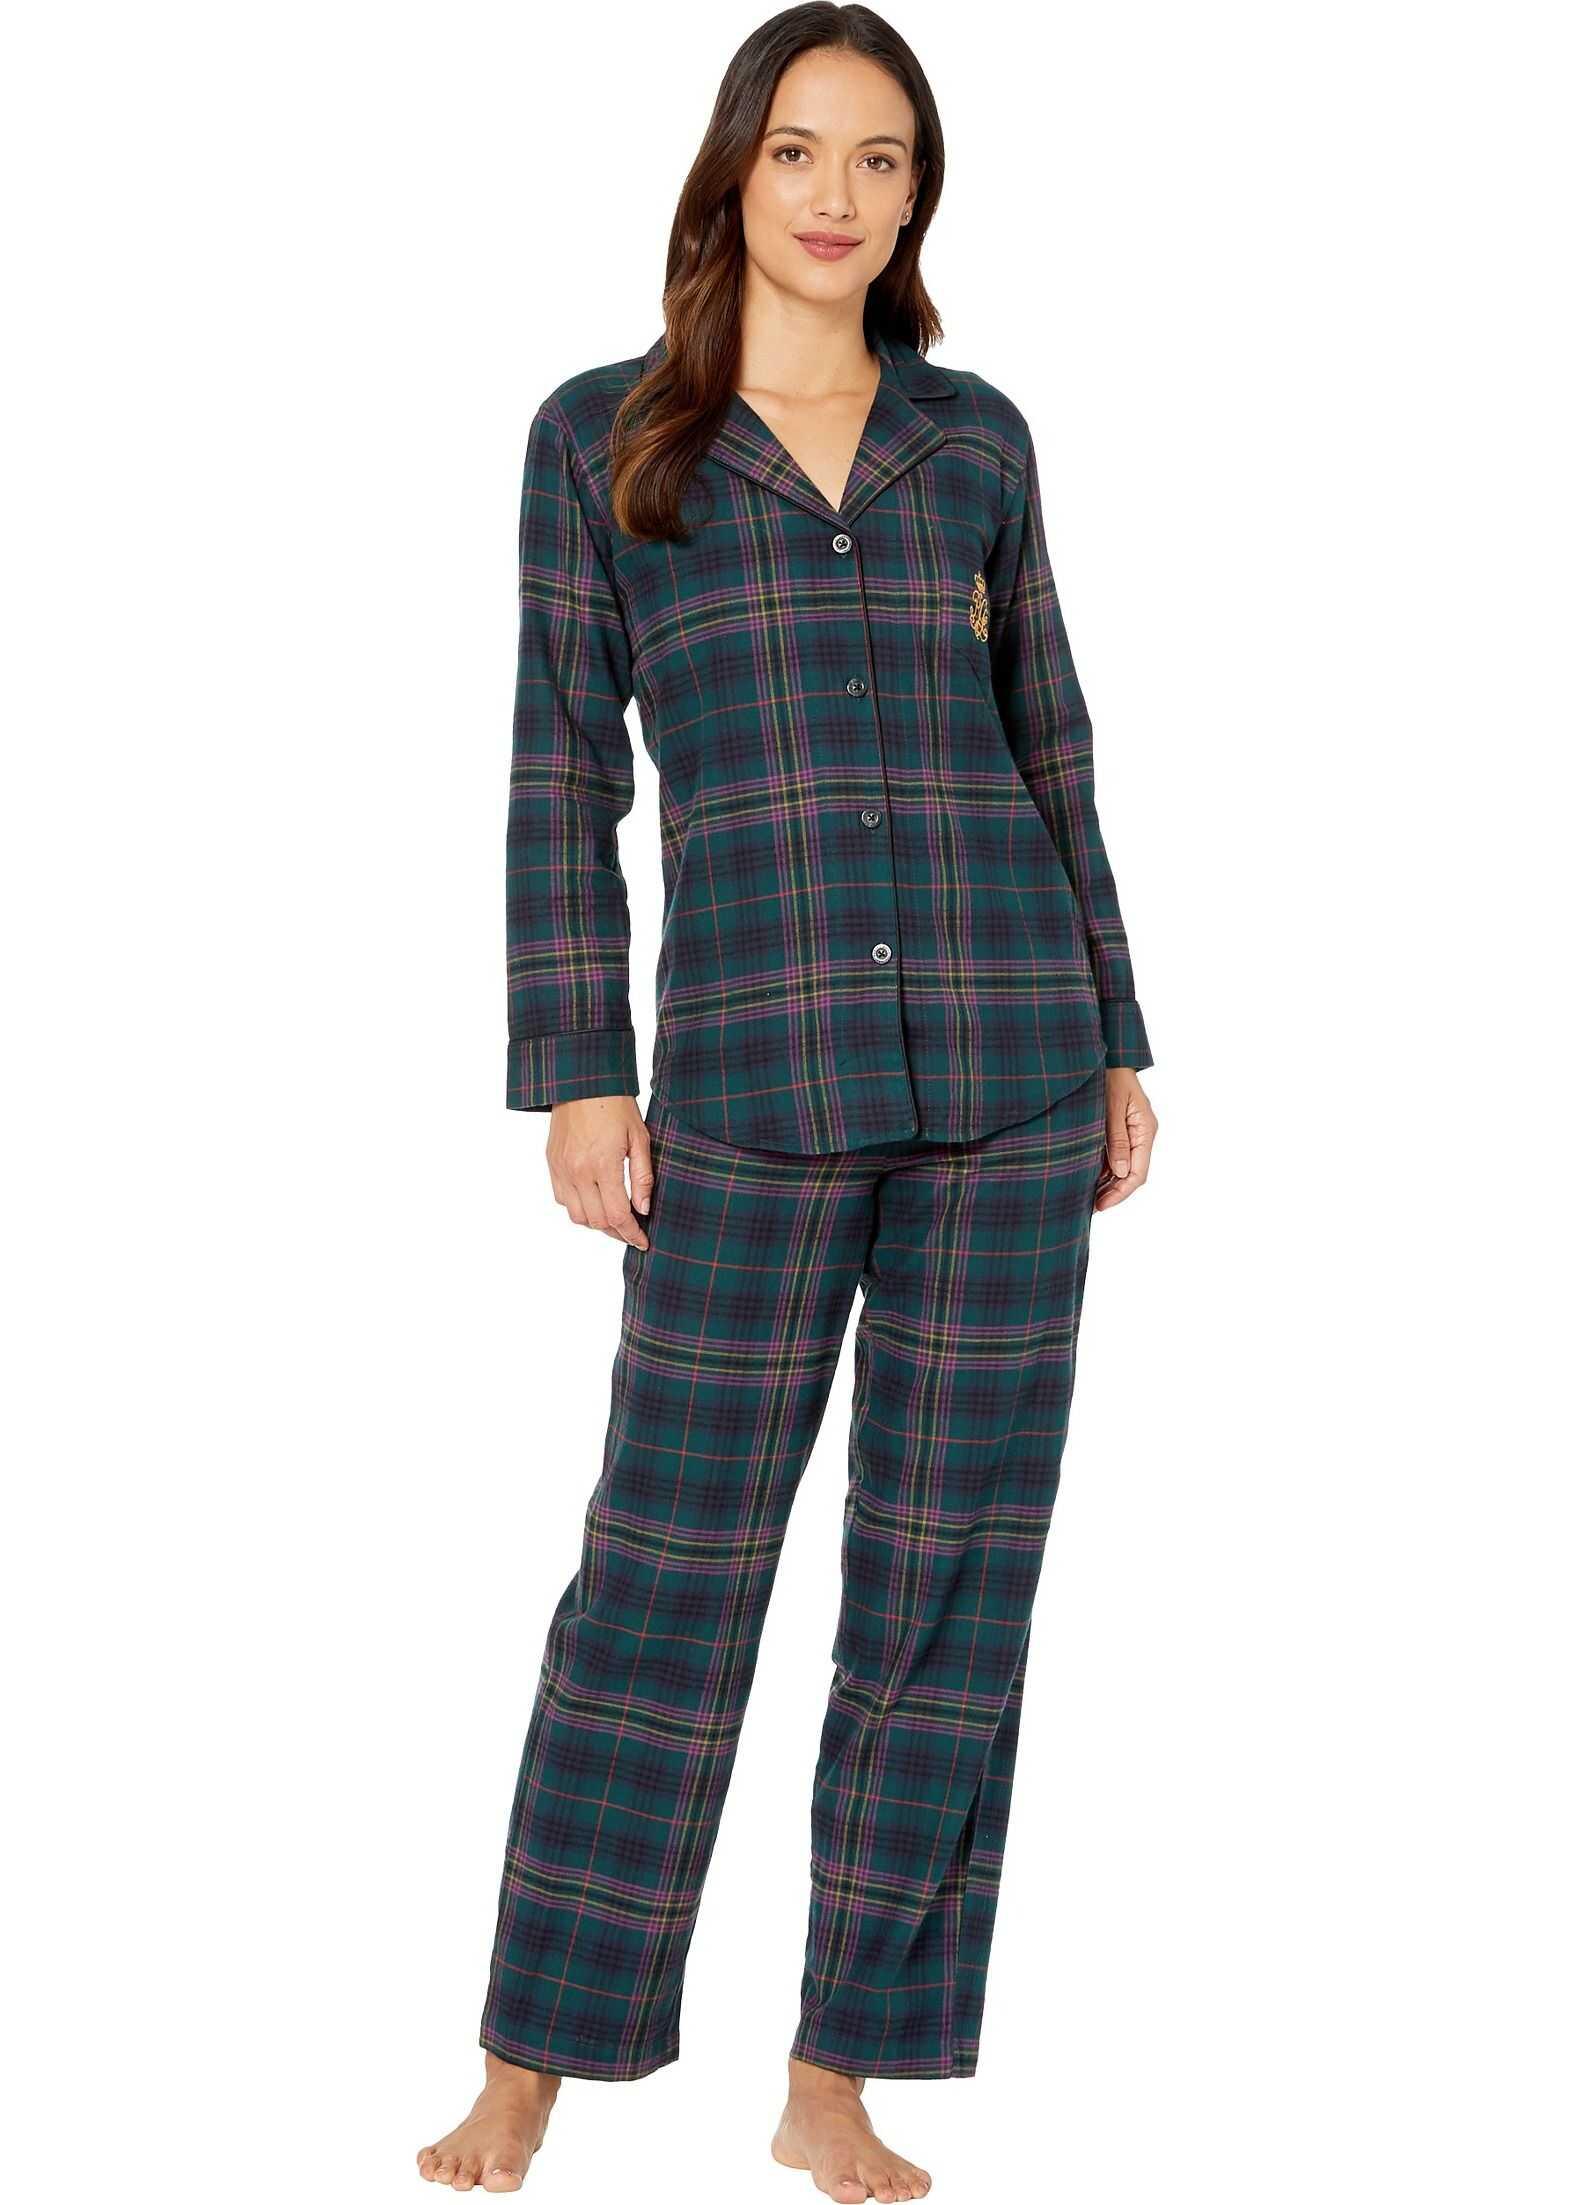 Ralph Lauren Petite Brushed Twill Long Sleeve Notch Collar Long Pants Pajama Set Green Plaid